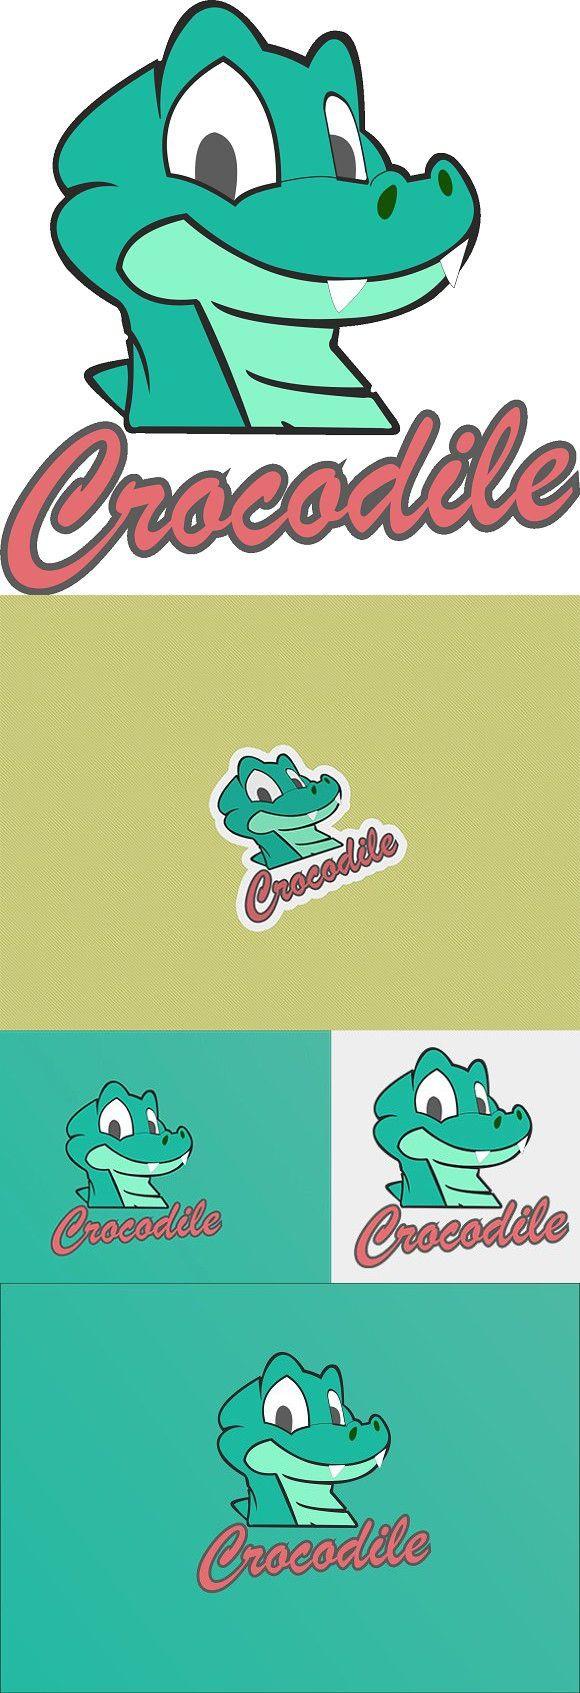 Crocodile Logo Template Desain, Grafis, Desain grafis